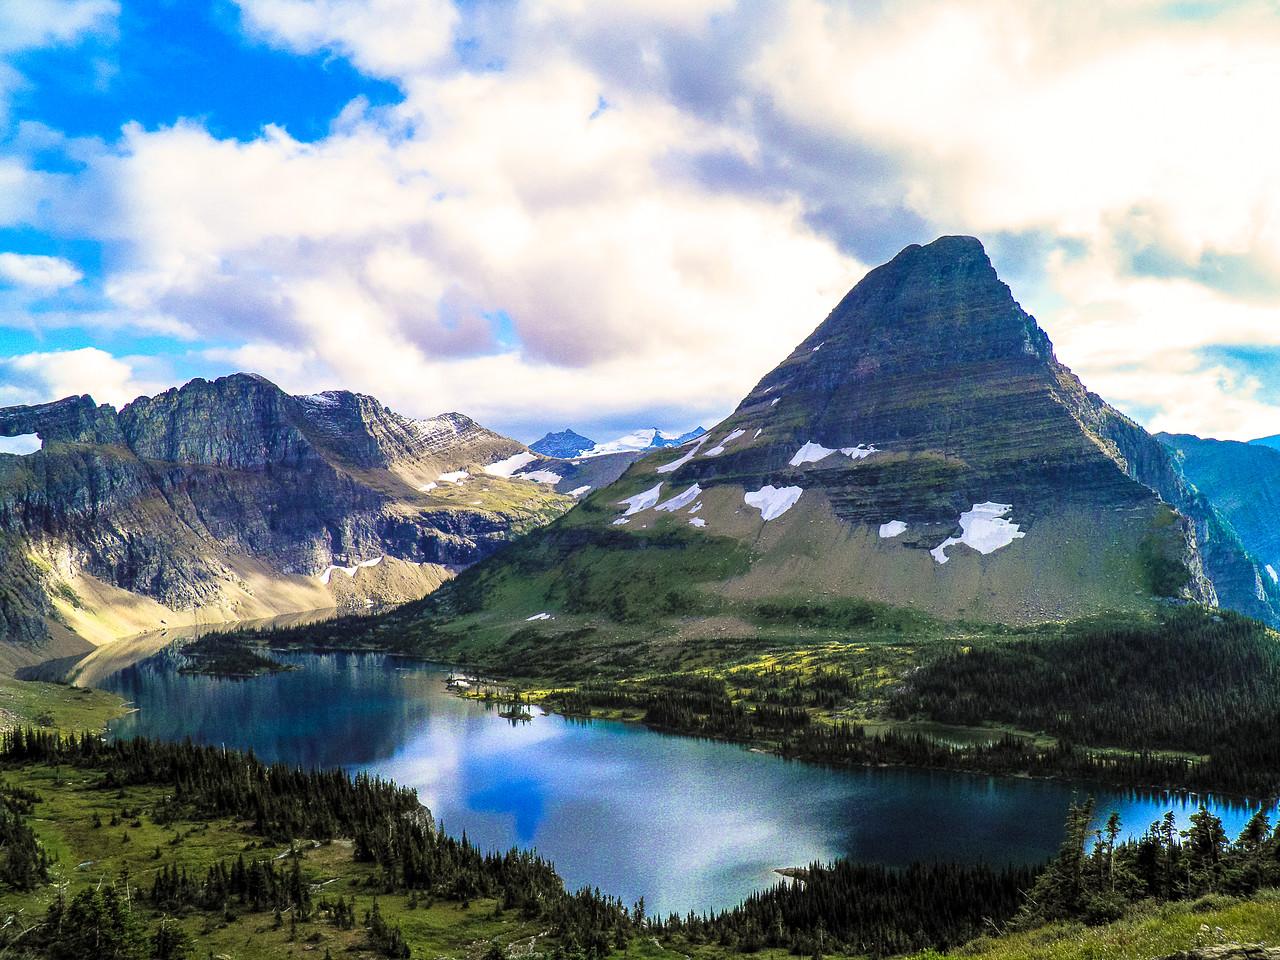 Breath-taking views in Glacier National Park